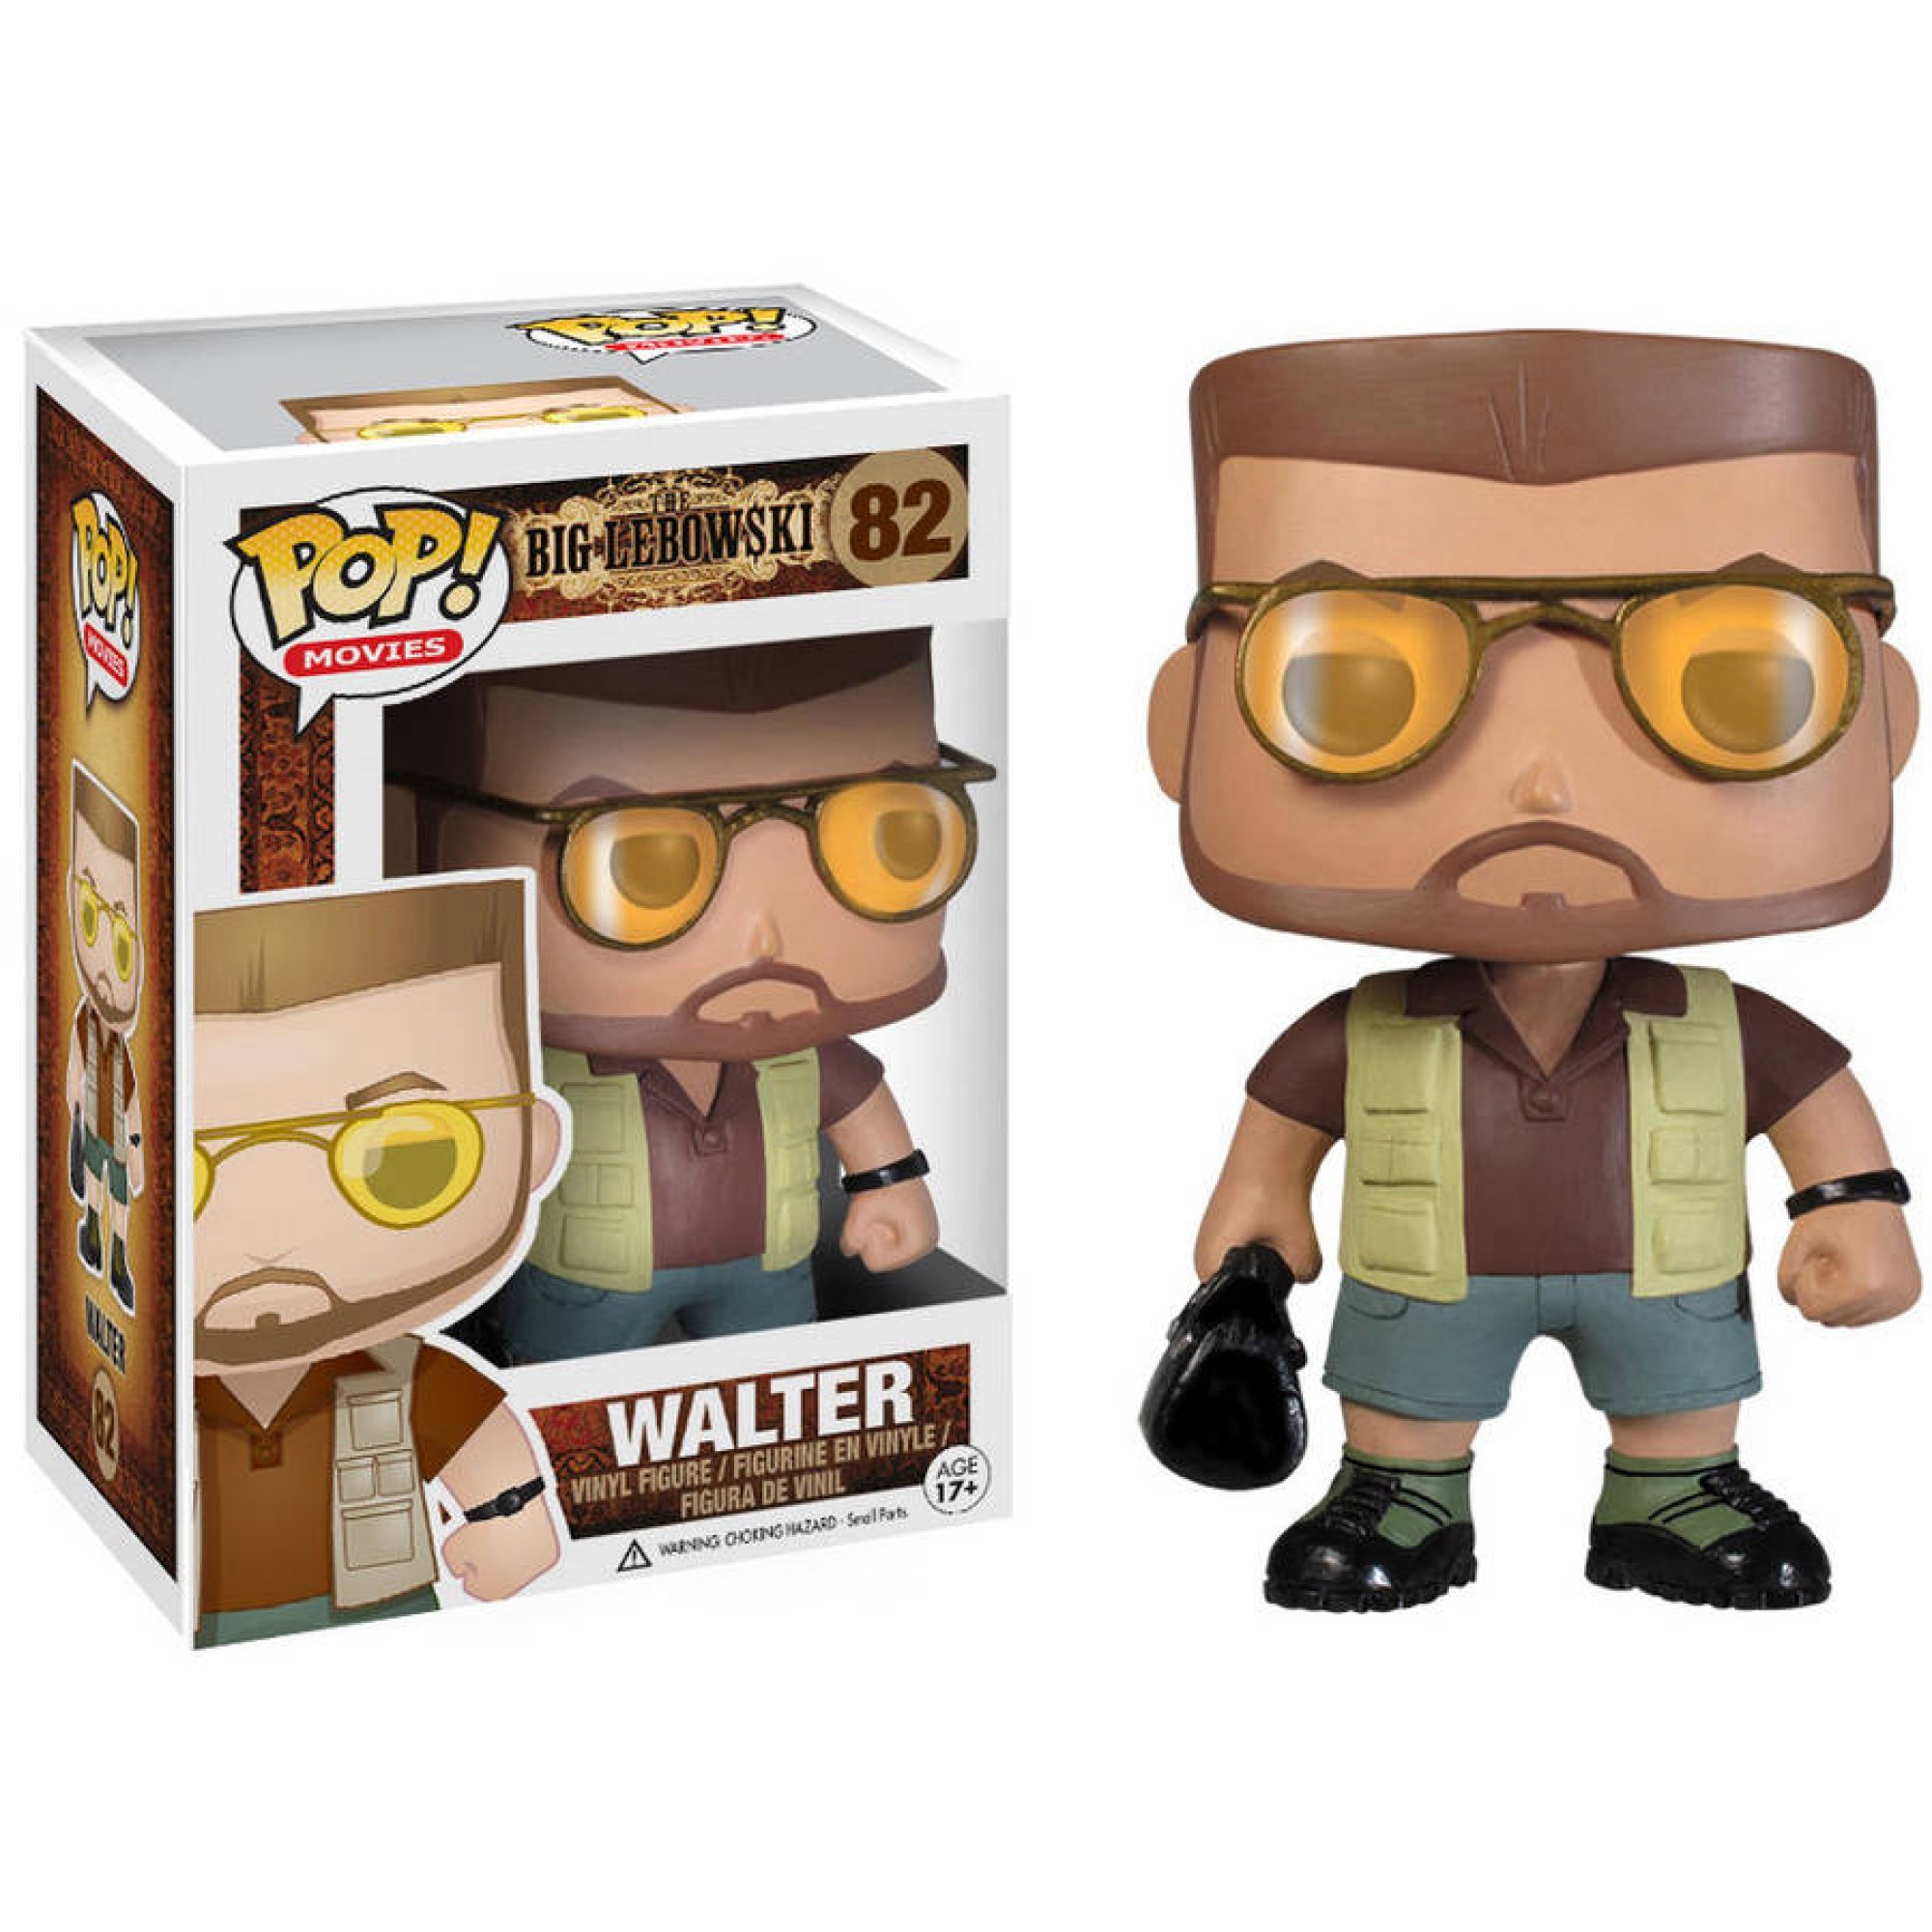 Funko Pop! Movies: The Big Lebowski, Walter